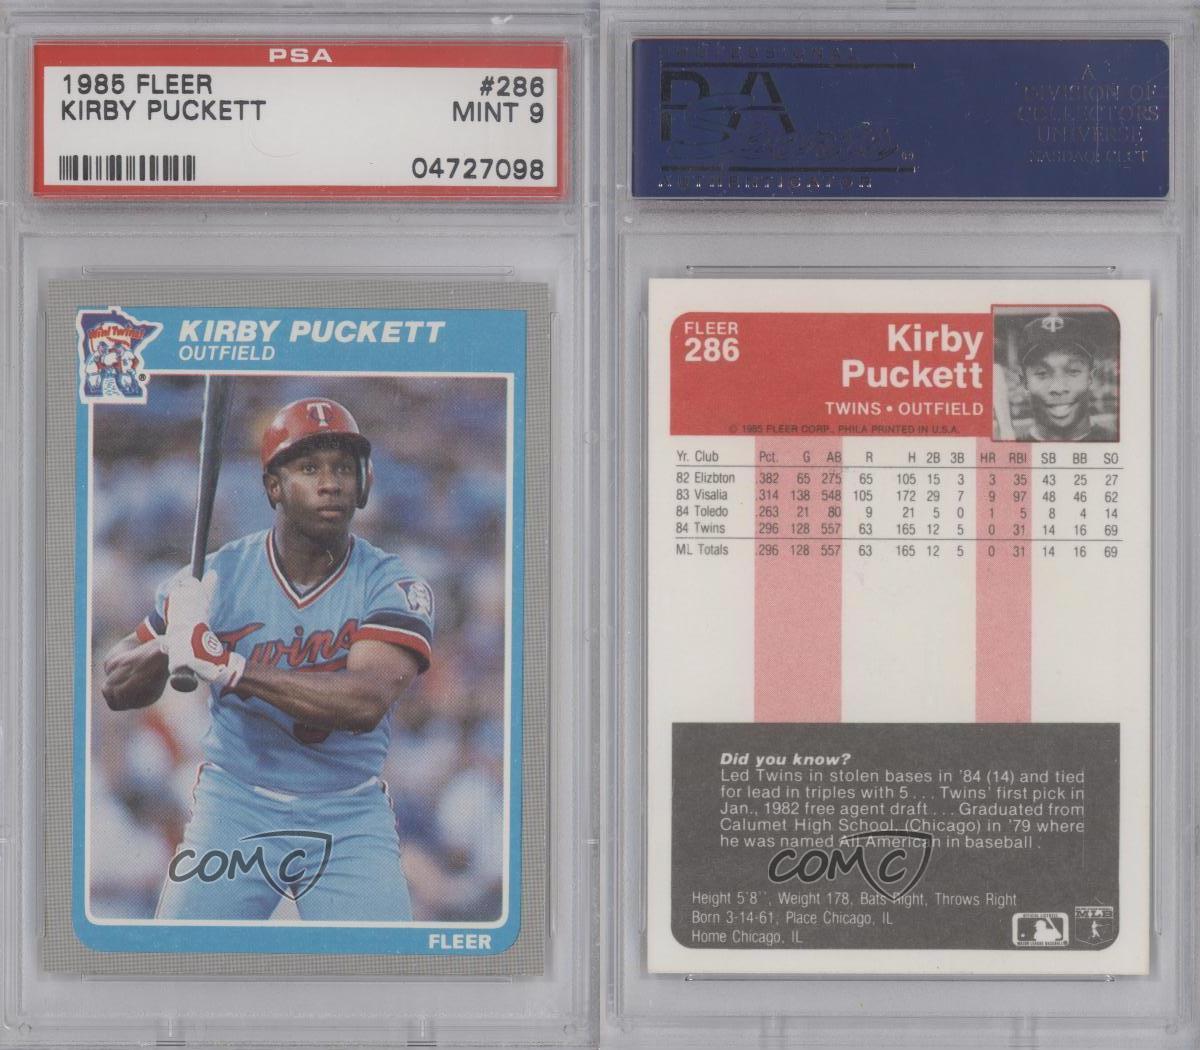 1985 Fleer #286 Kirby Puckett PSA 9 Minnesota Twins RC